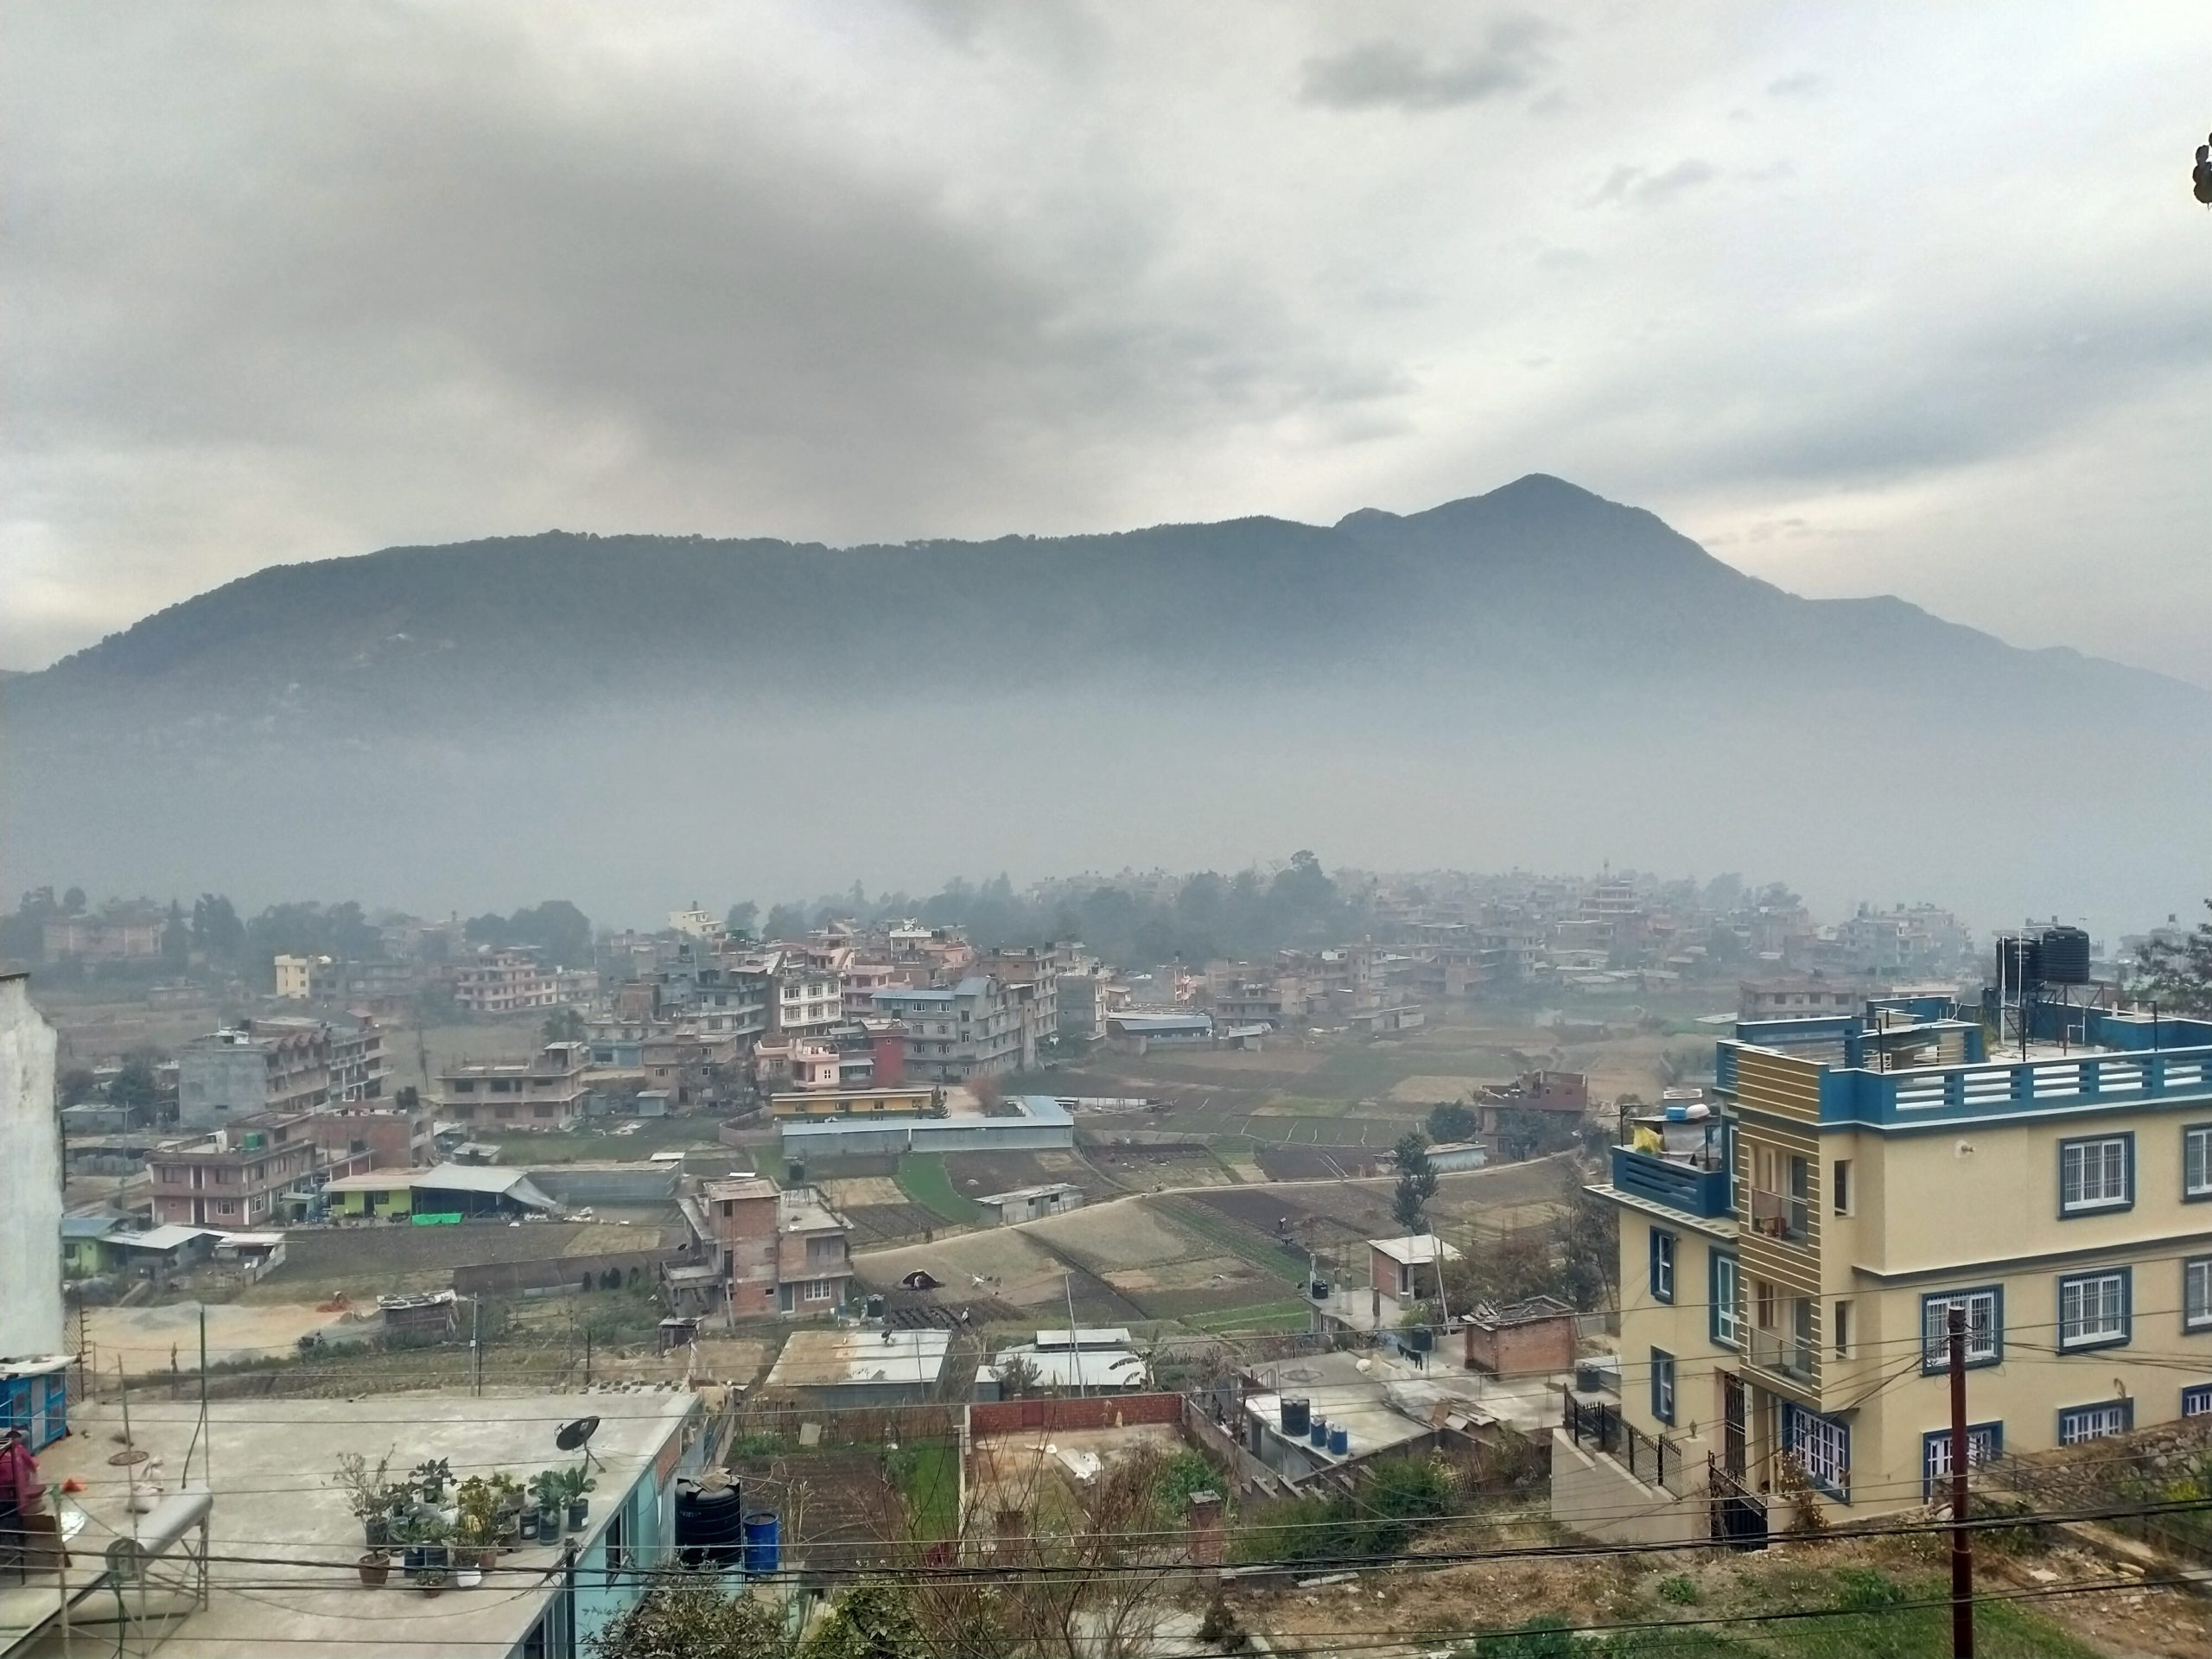 काठमाडौं प्रदूषित शहरको ९६औं स्थानमा